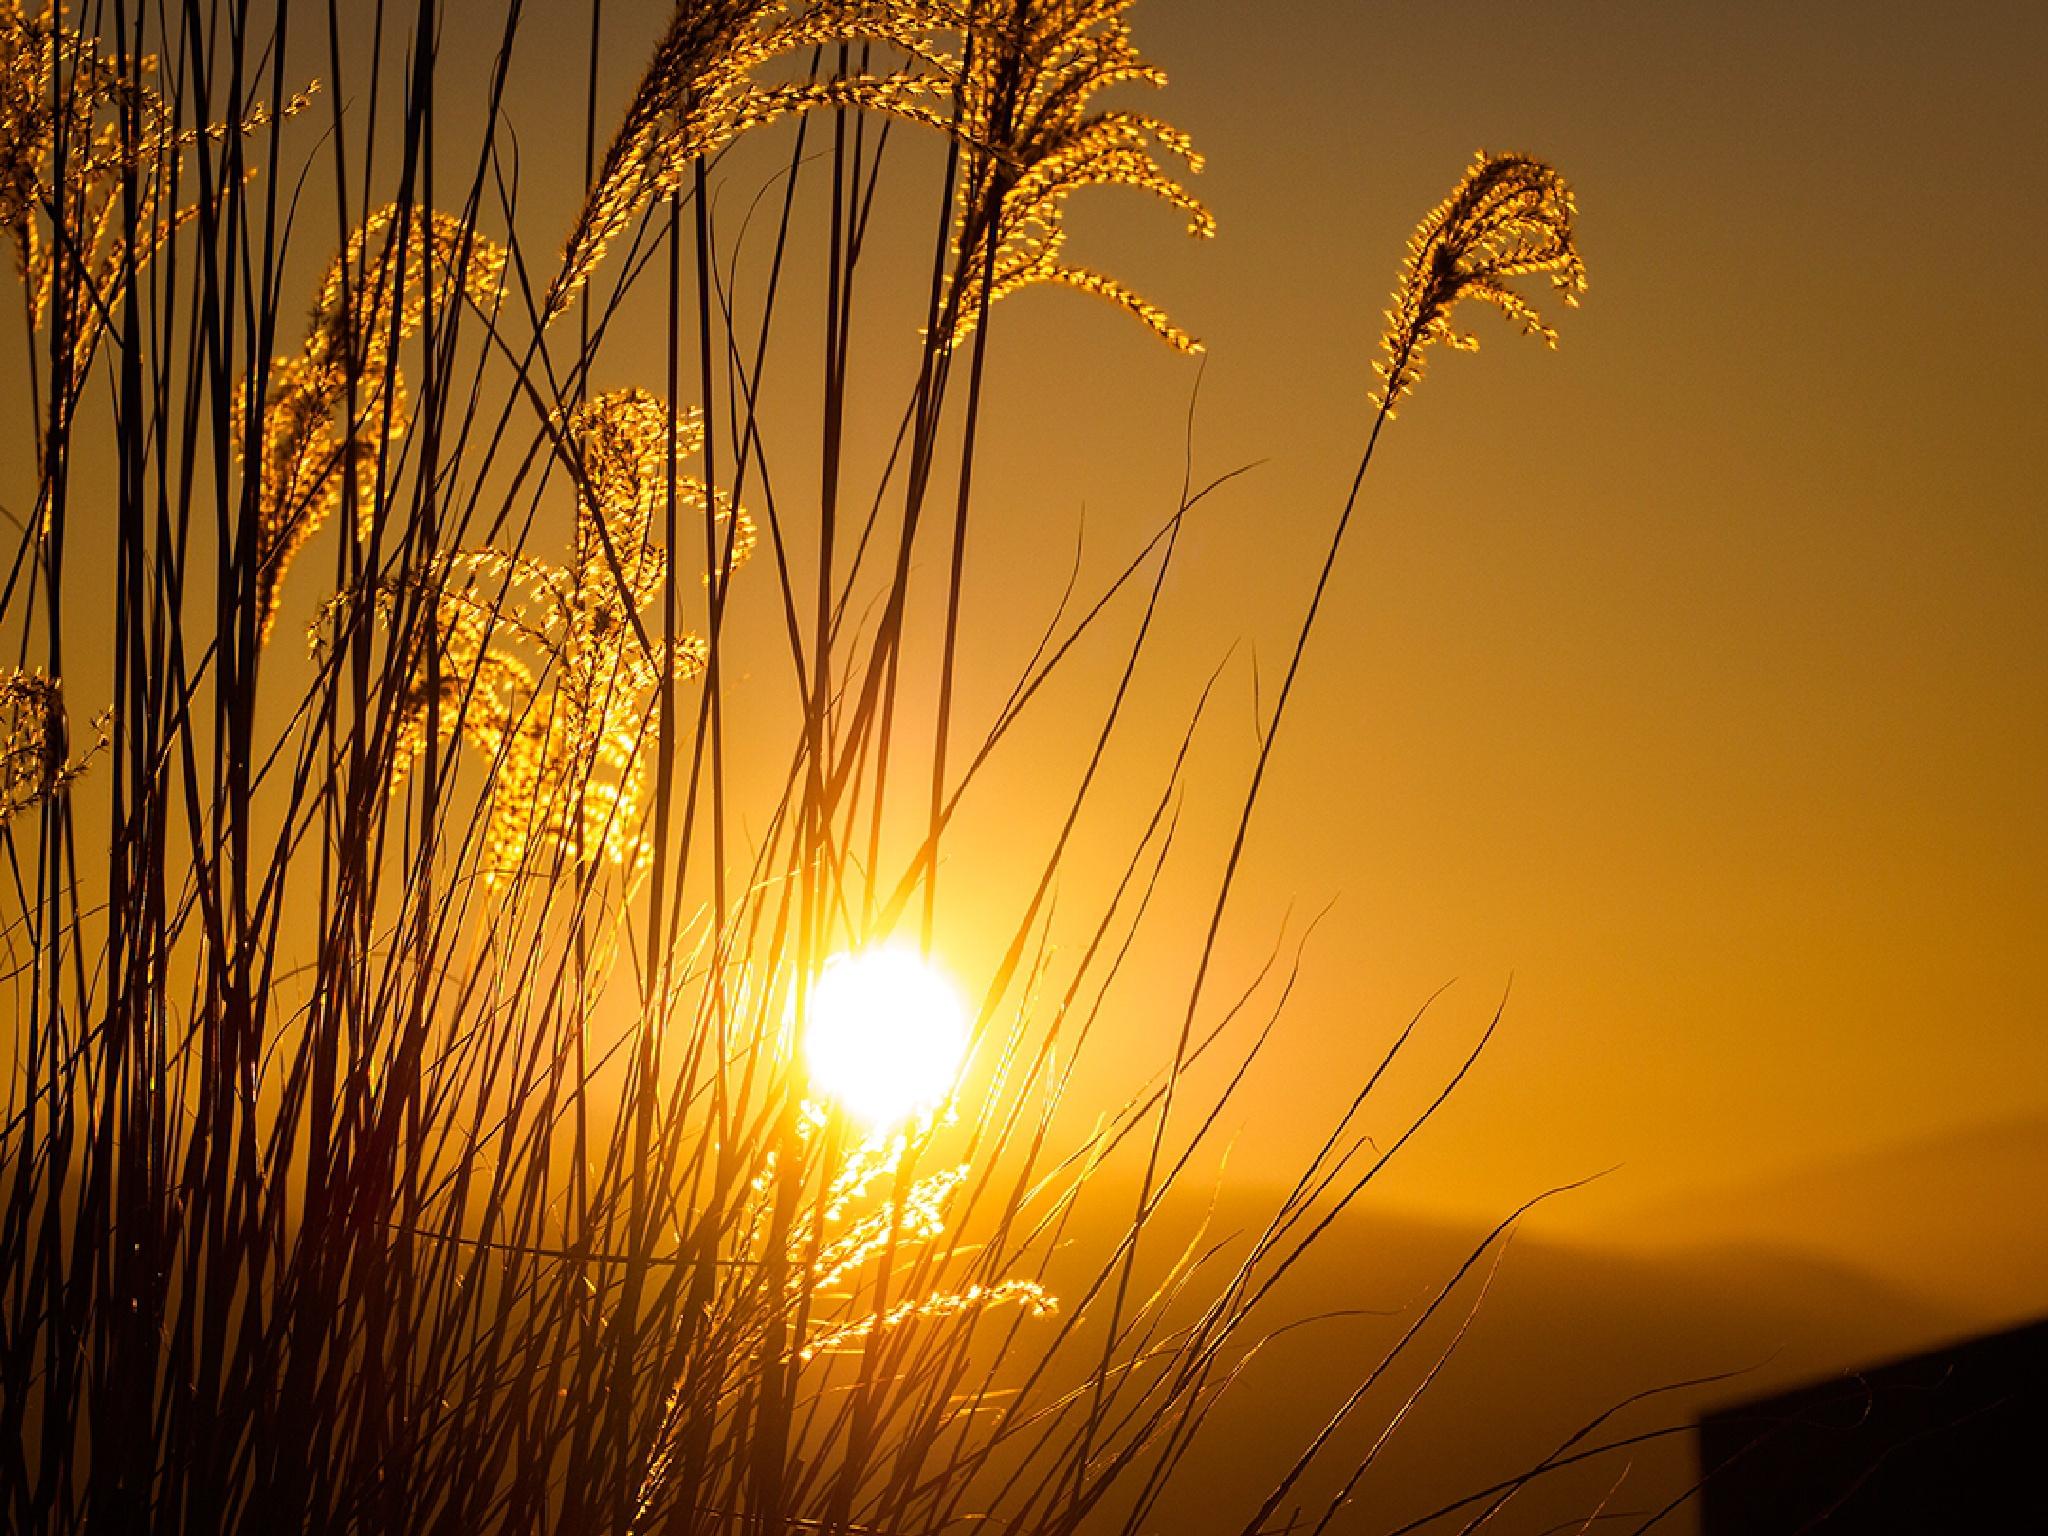 Good morning! by Ganesh Neumair